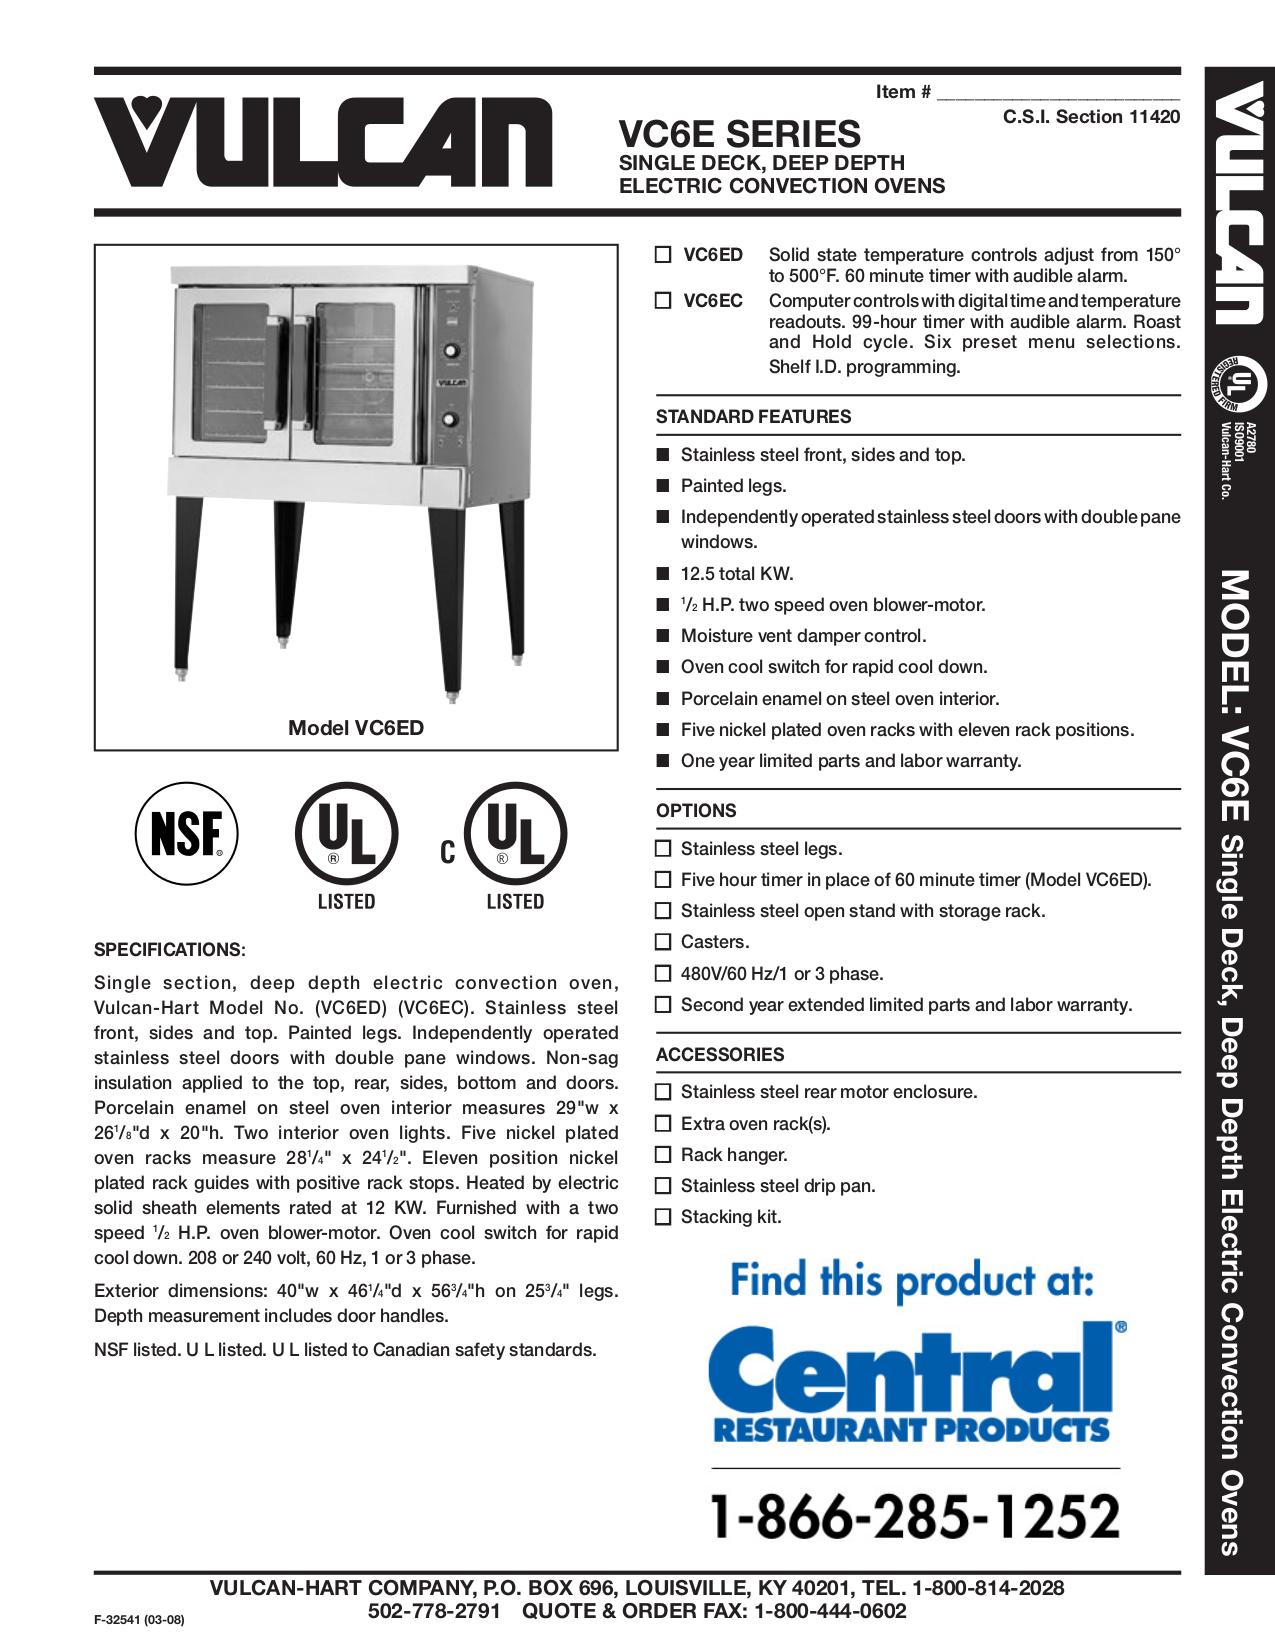 pdf for Vulcan Oven VC6EC manual